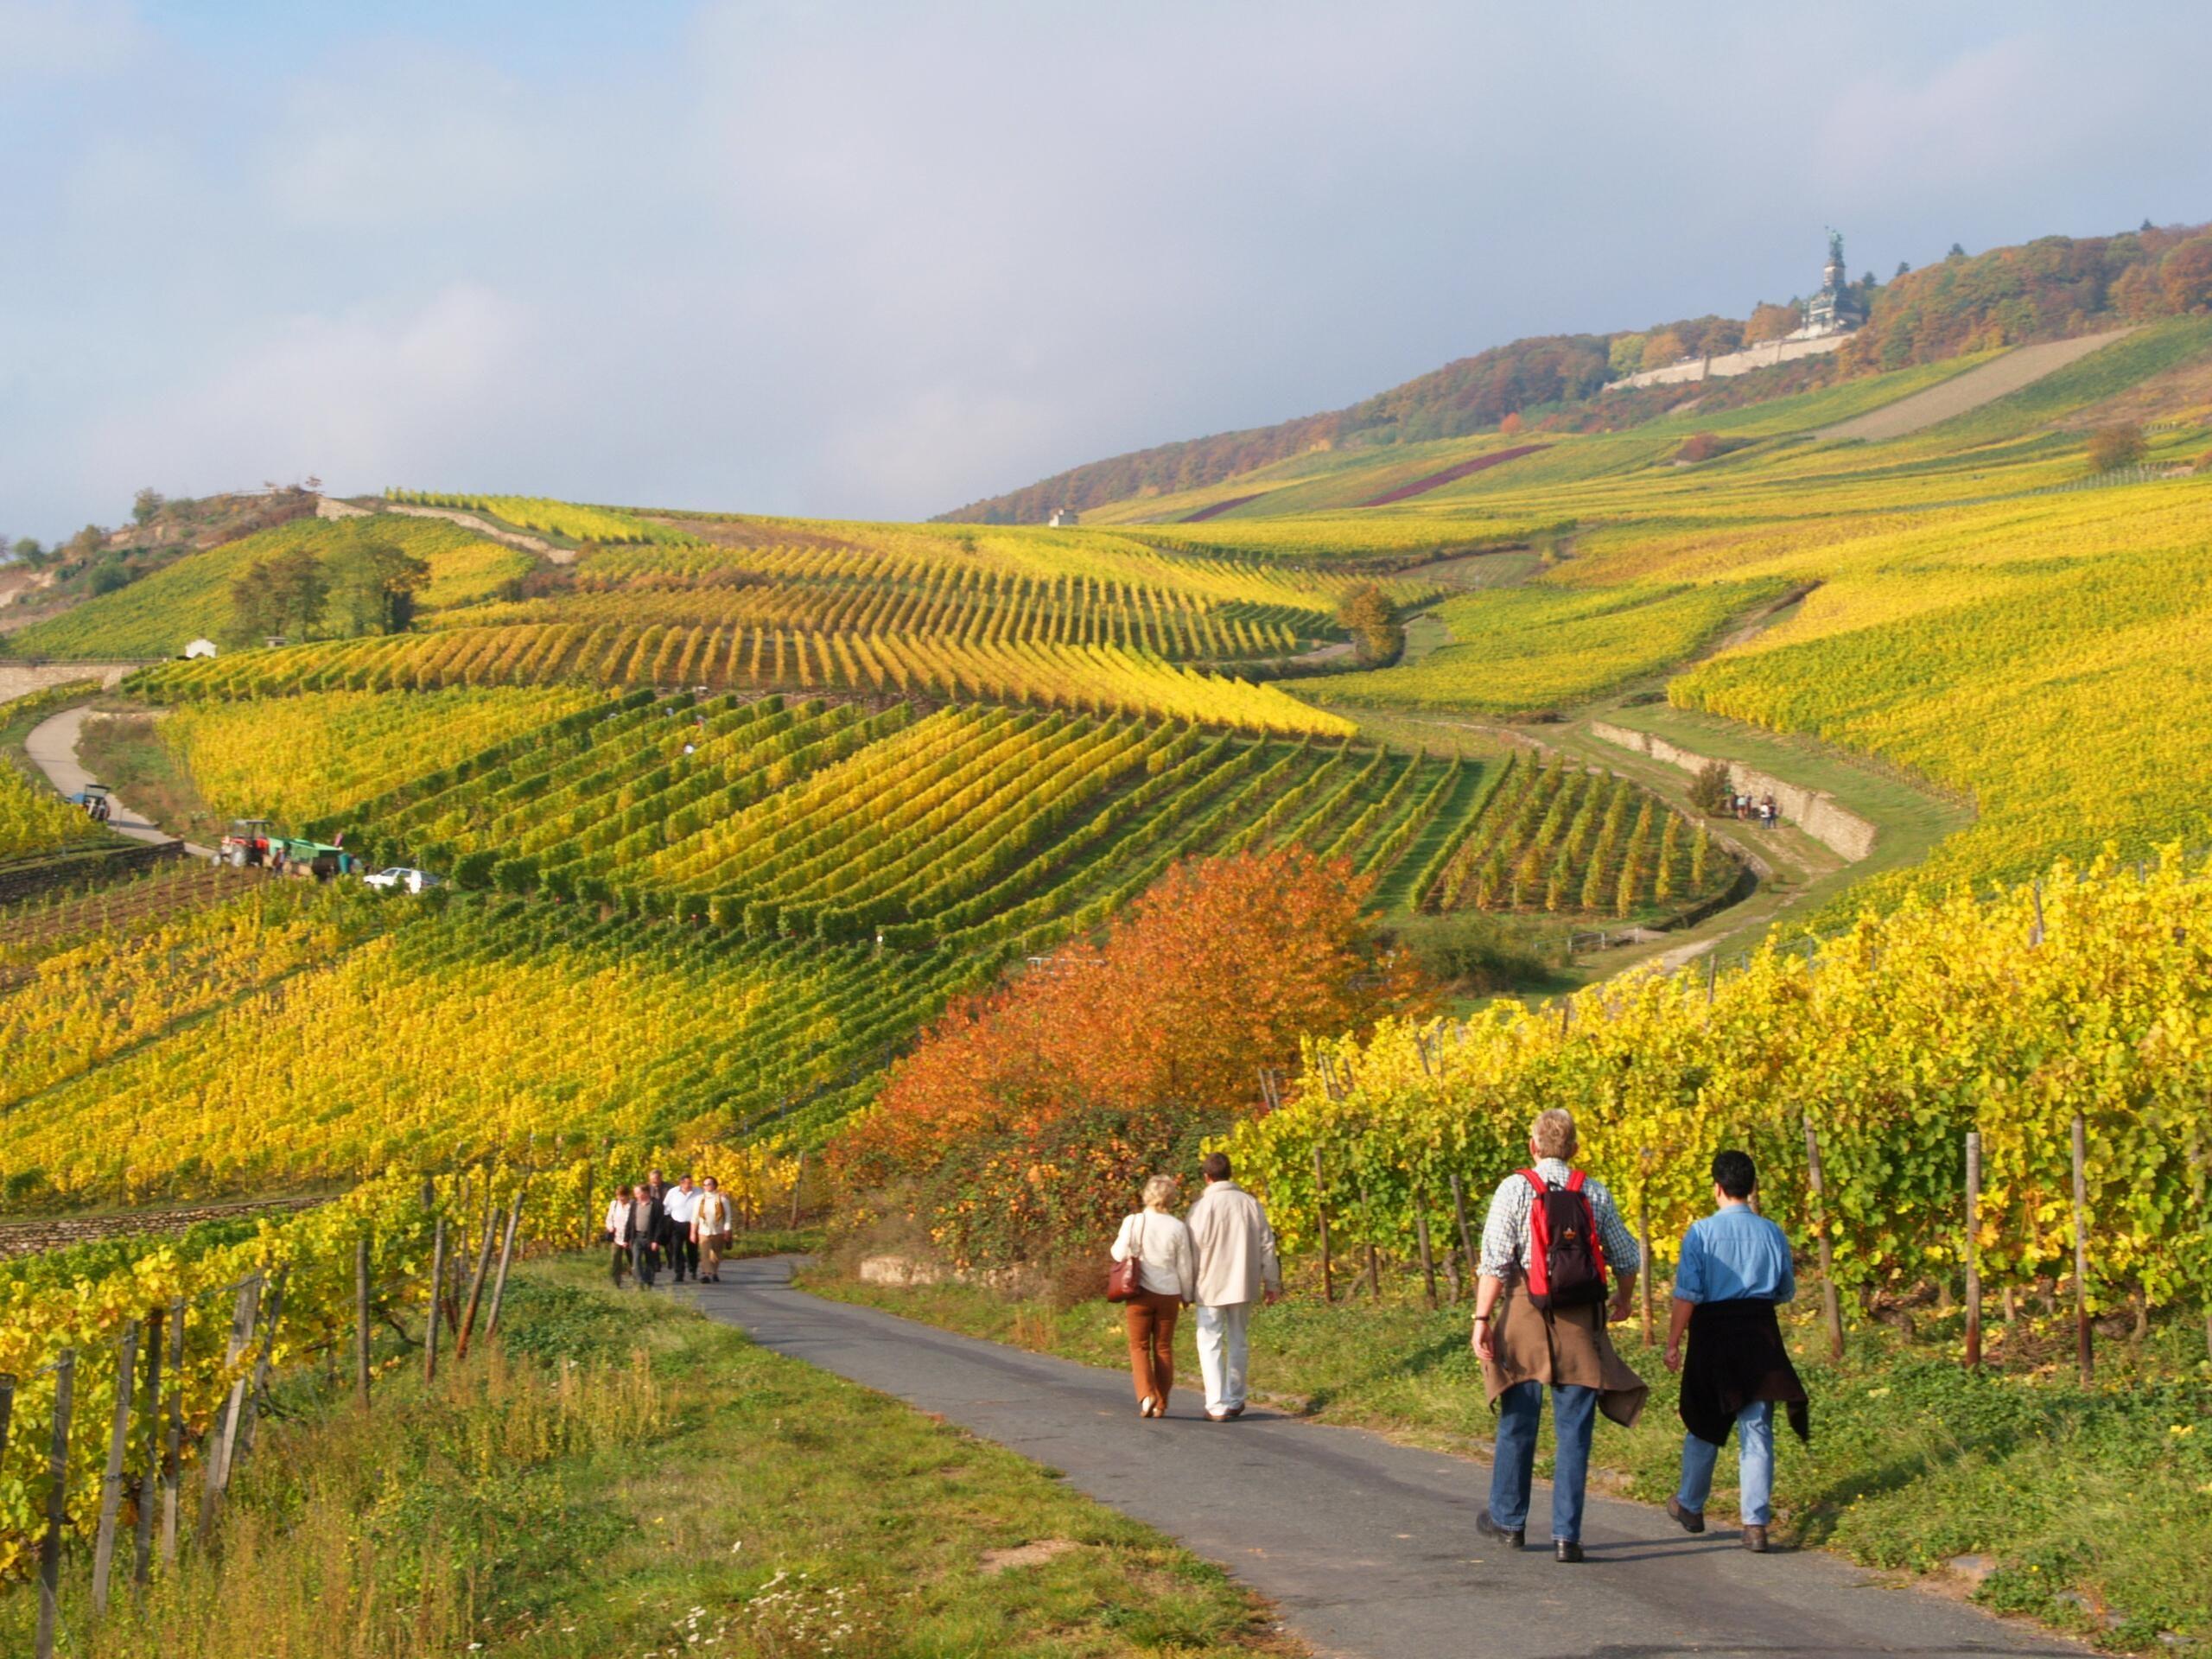 8-daagse wandelvakantie Rheinsteig 1e deel